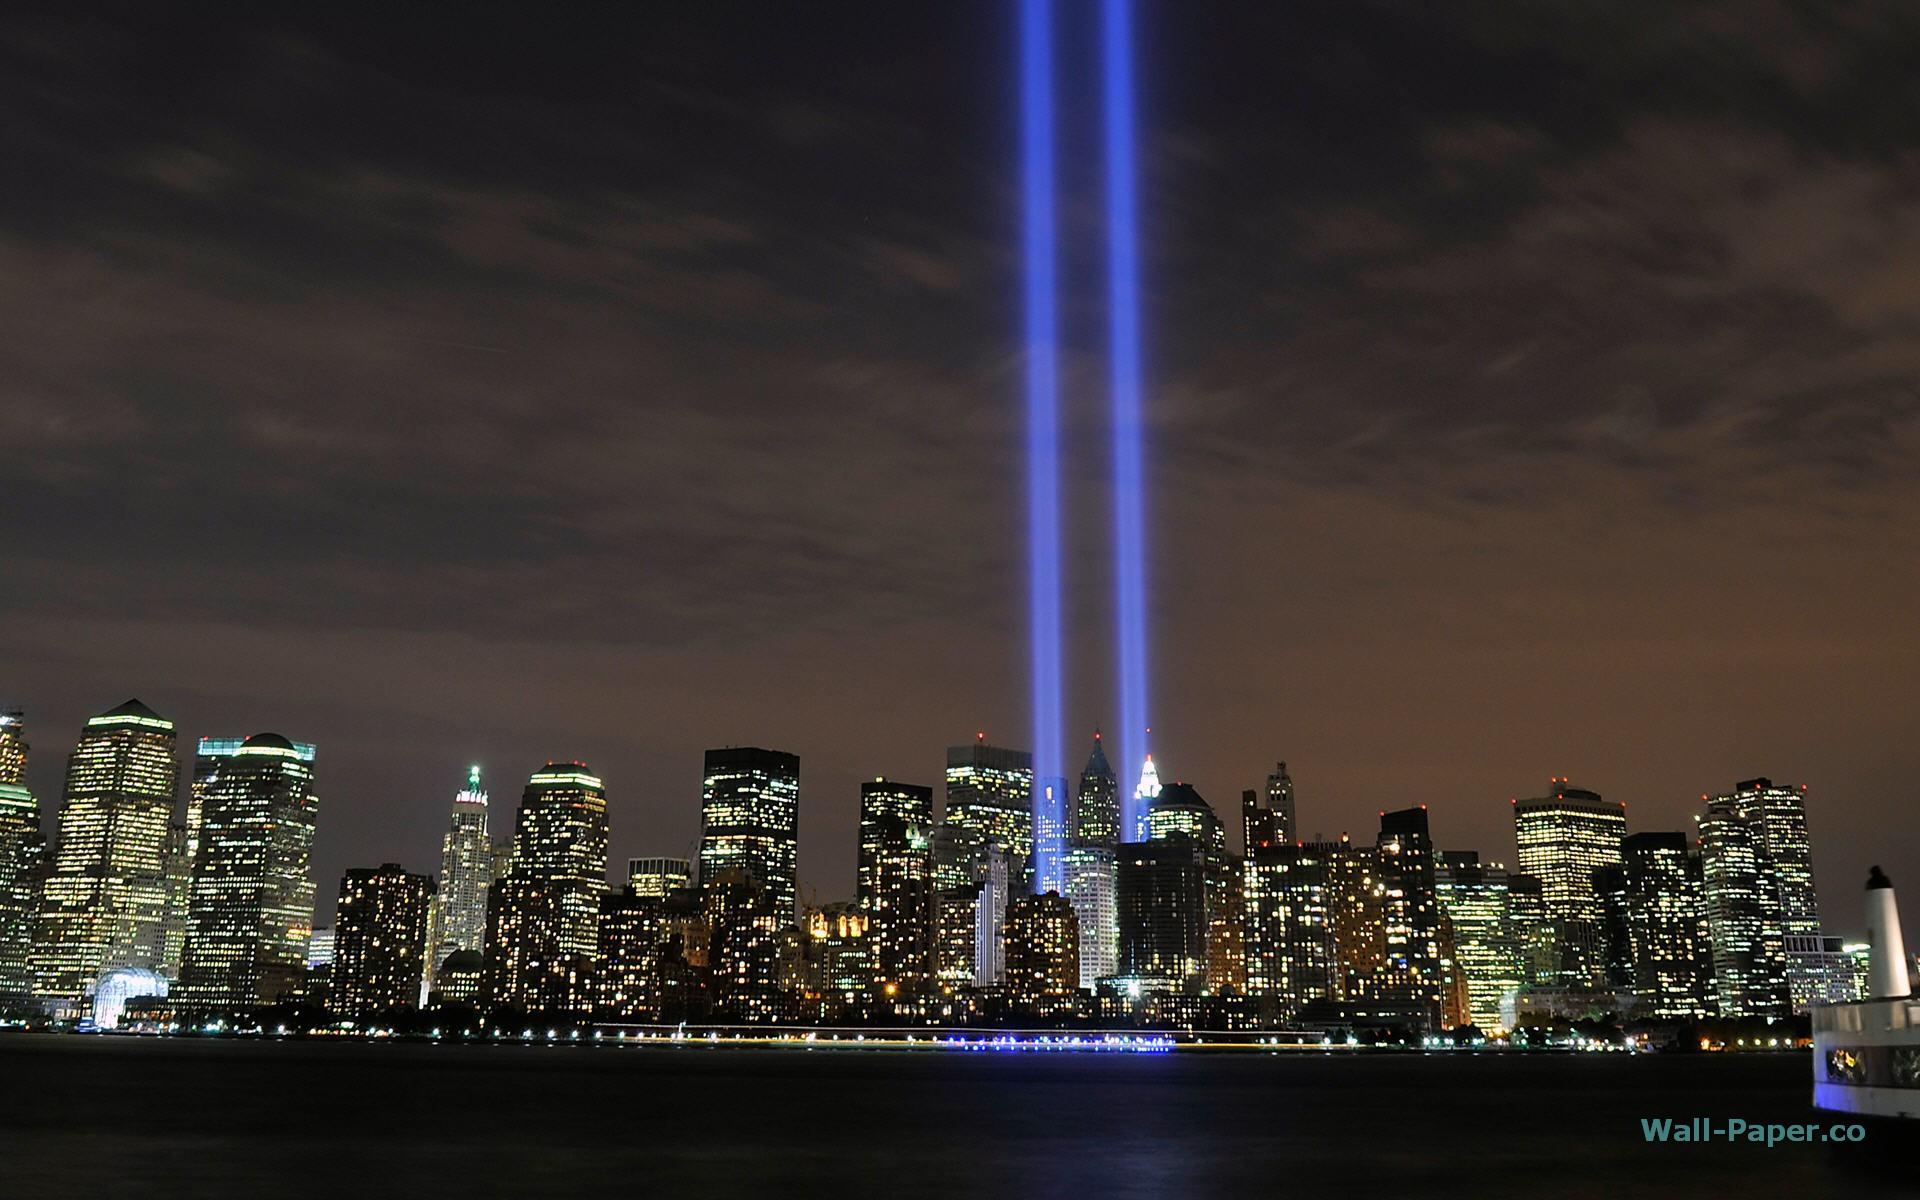 September 11 Memorial Desktop Wallpaper 1920x1200 1920x1200